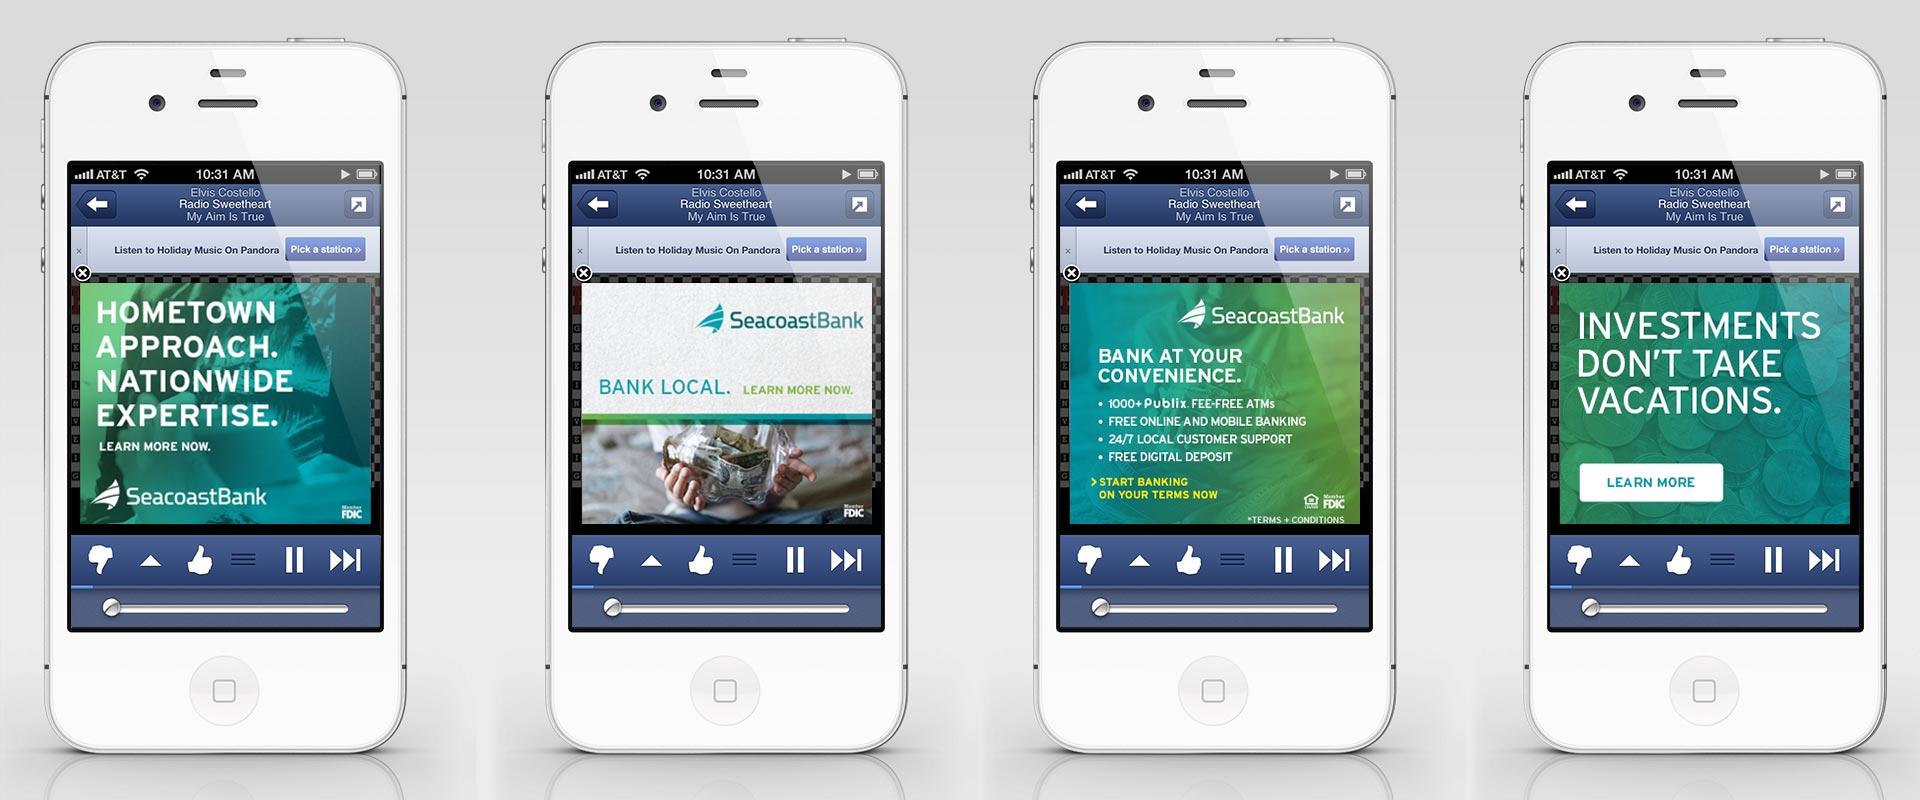 Seacoast Bank - Digital Advertising